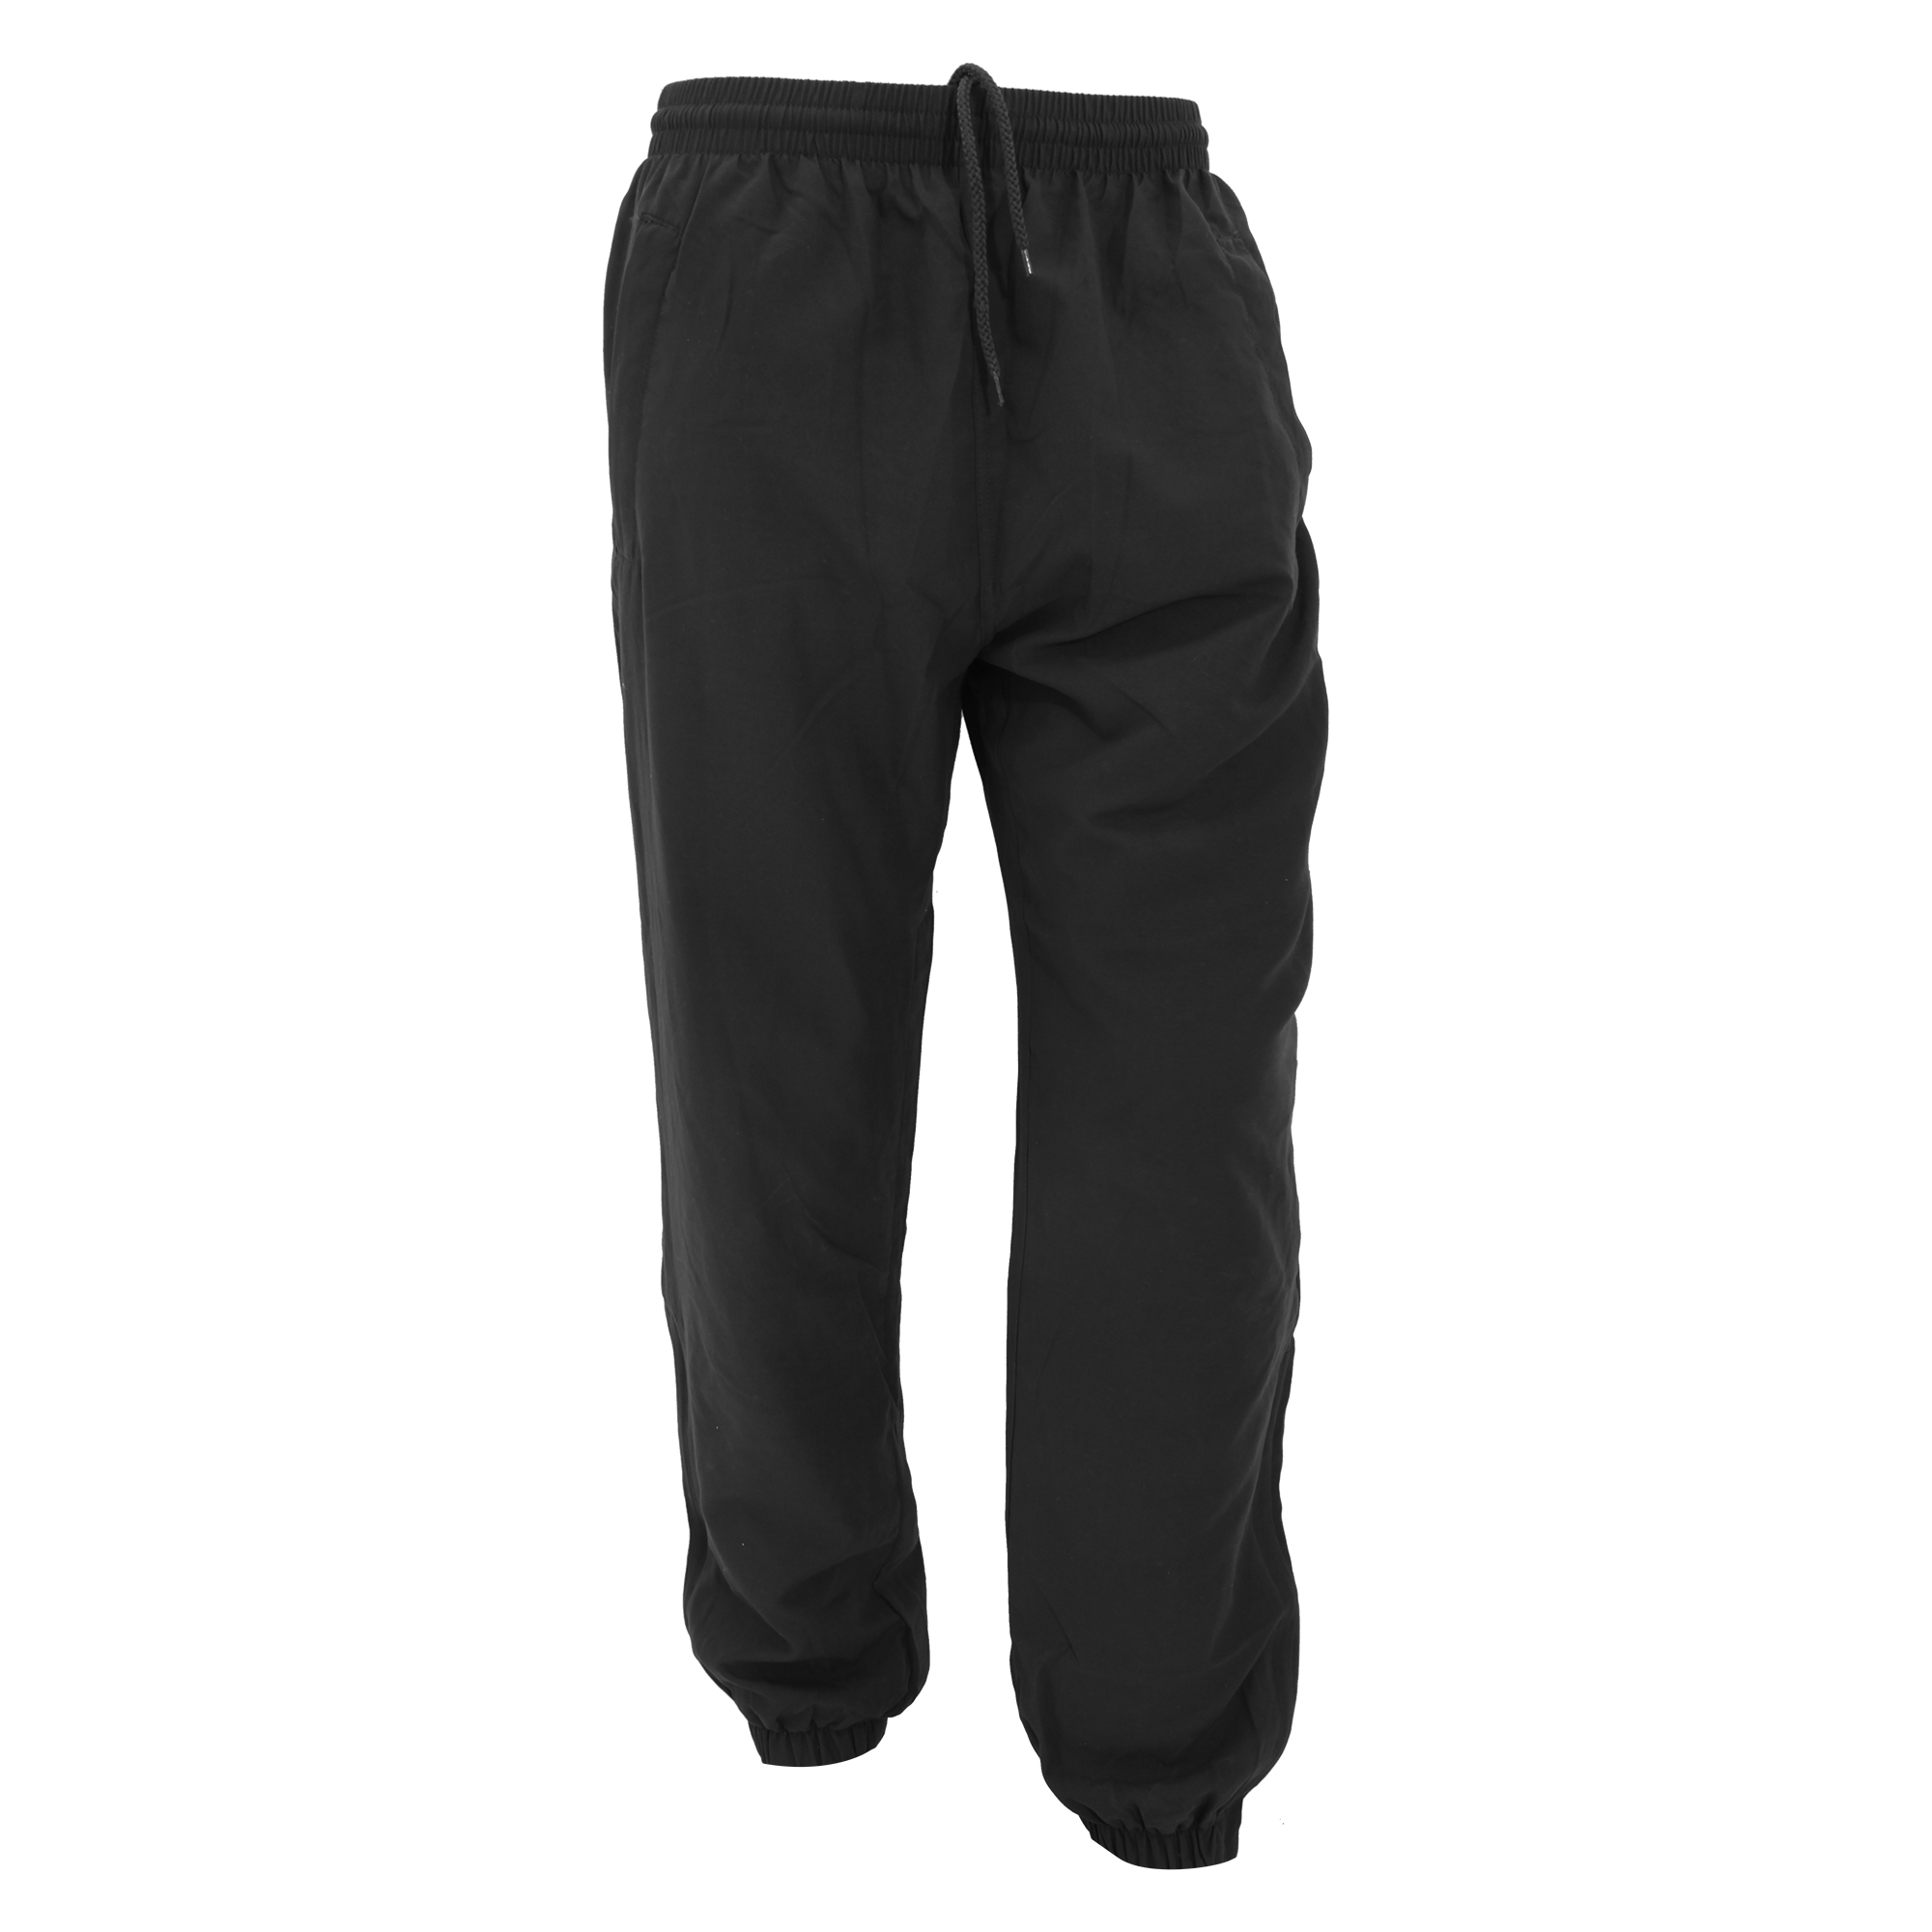 adidas 3 Stripe Cuffed Black Track Pants